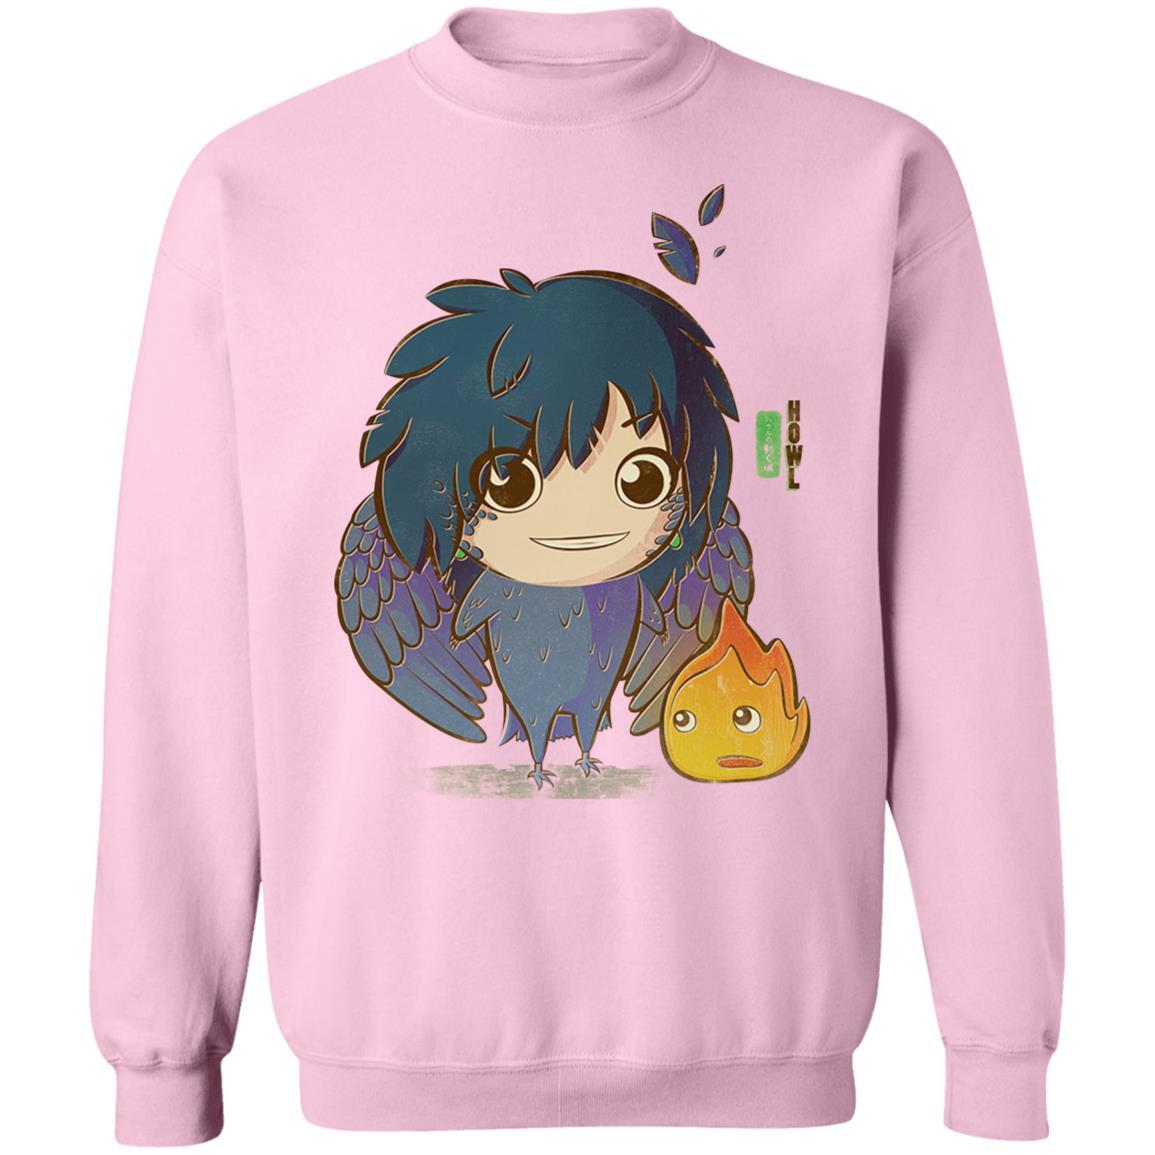 Howl's Moving Castle – Howl Chibi Sweatshirt